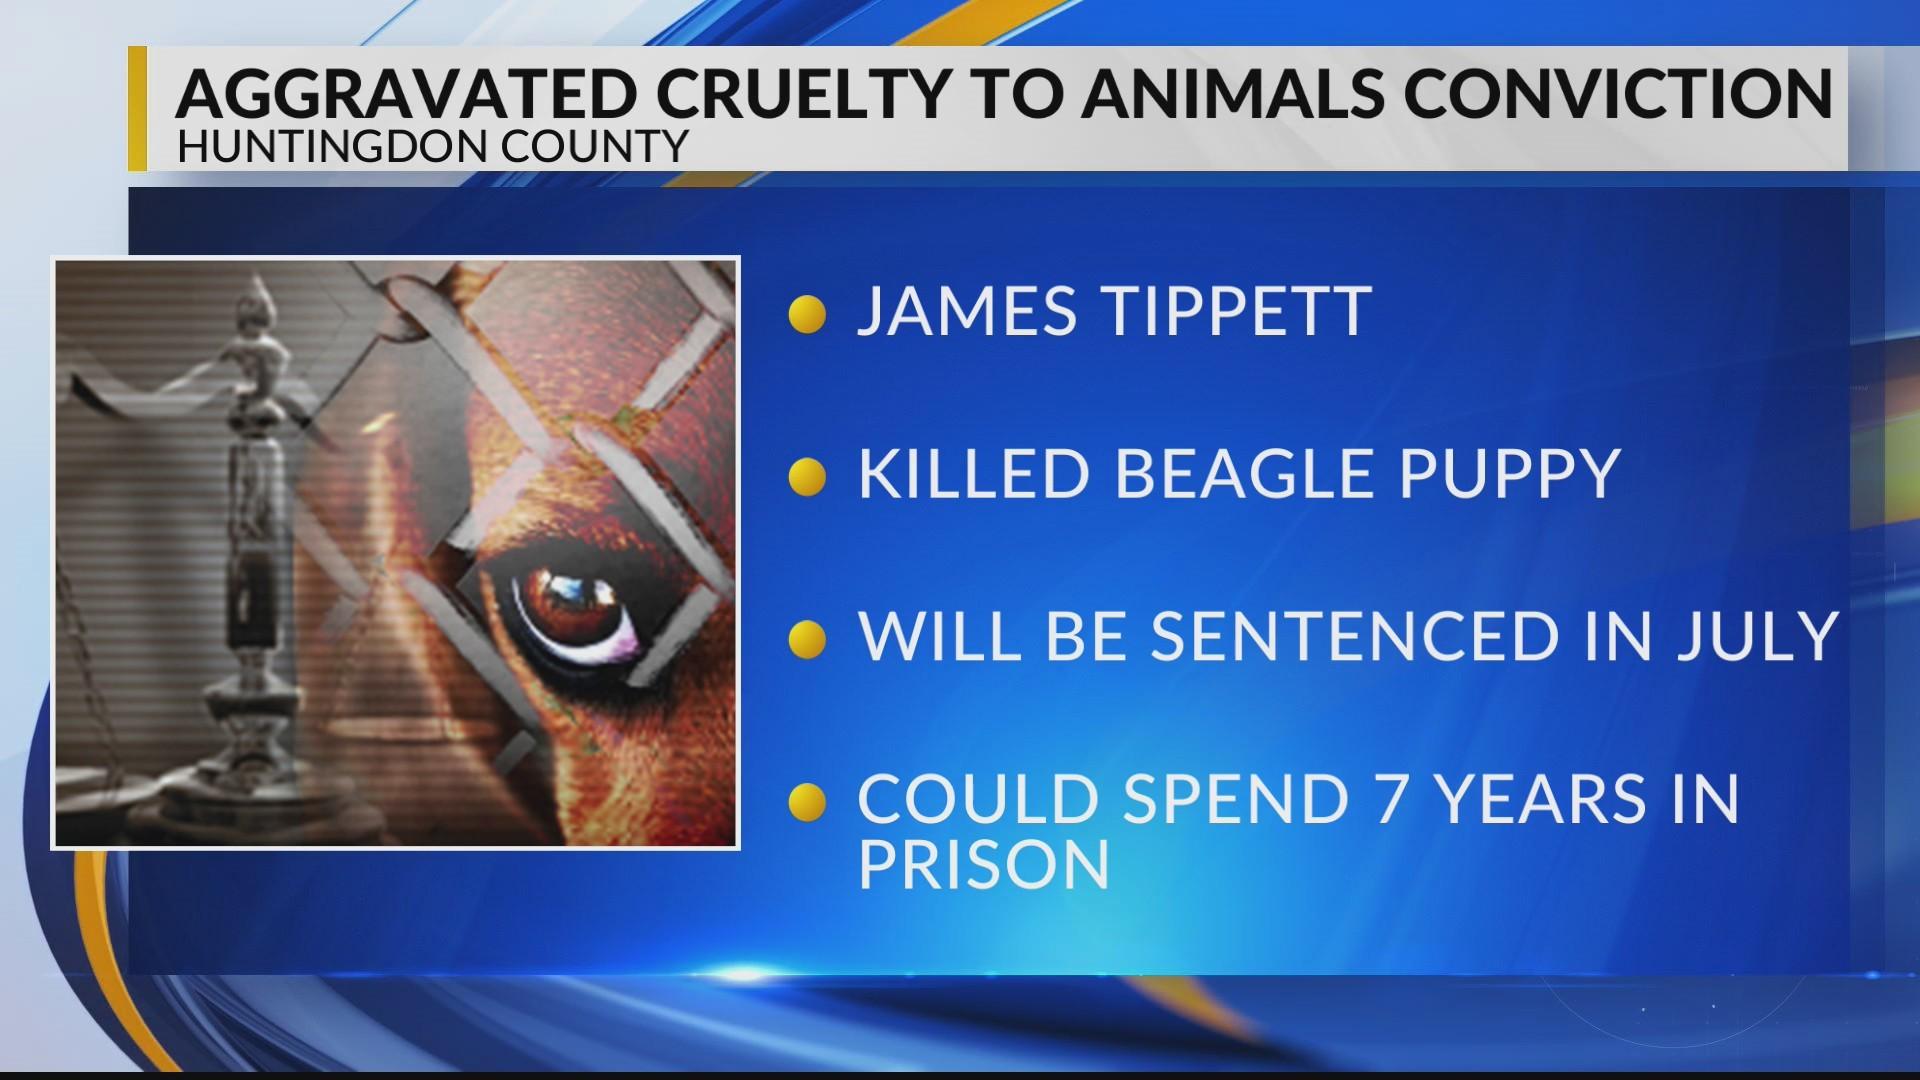 Aggravated Cruelty to Animals Conviction